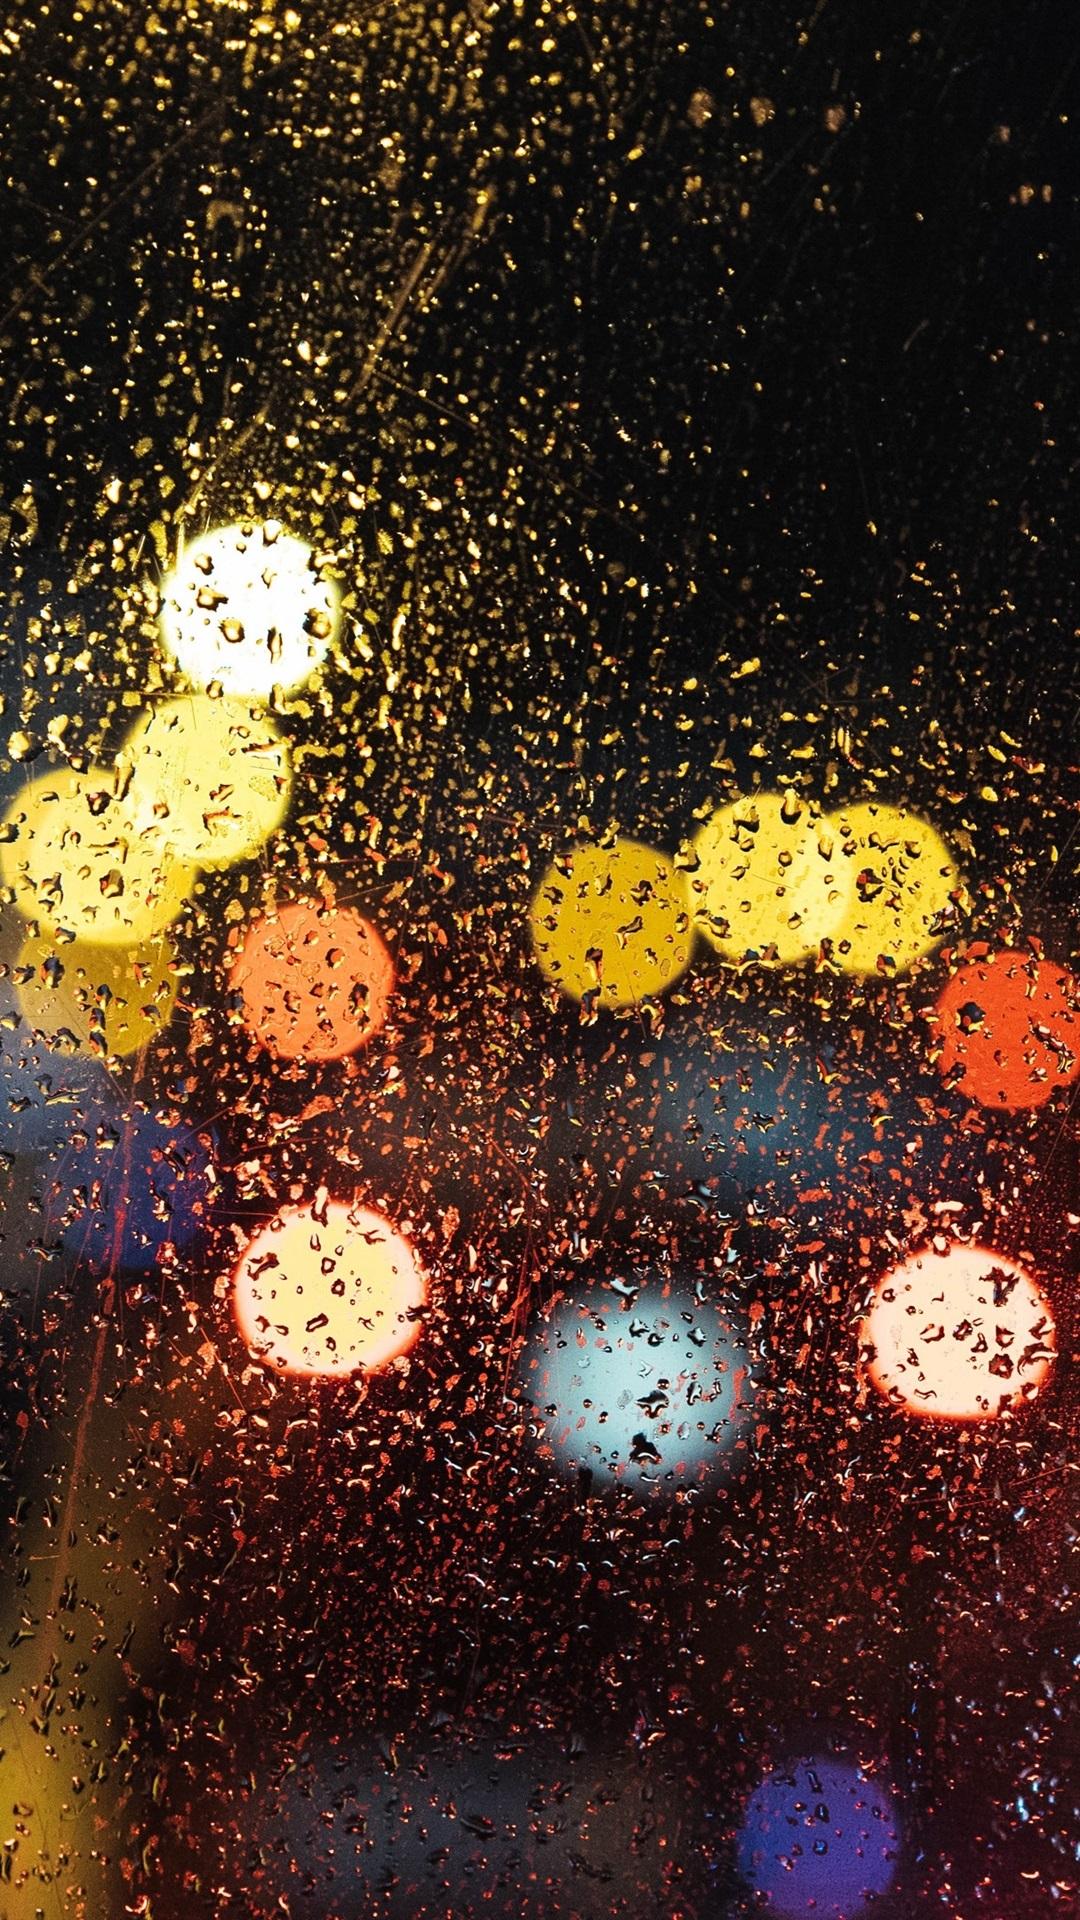 Rainy Day Night Glass Water Drops Light Circles